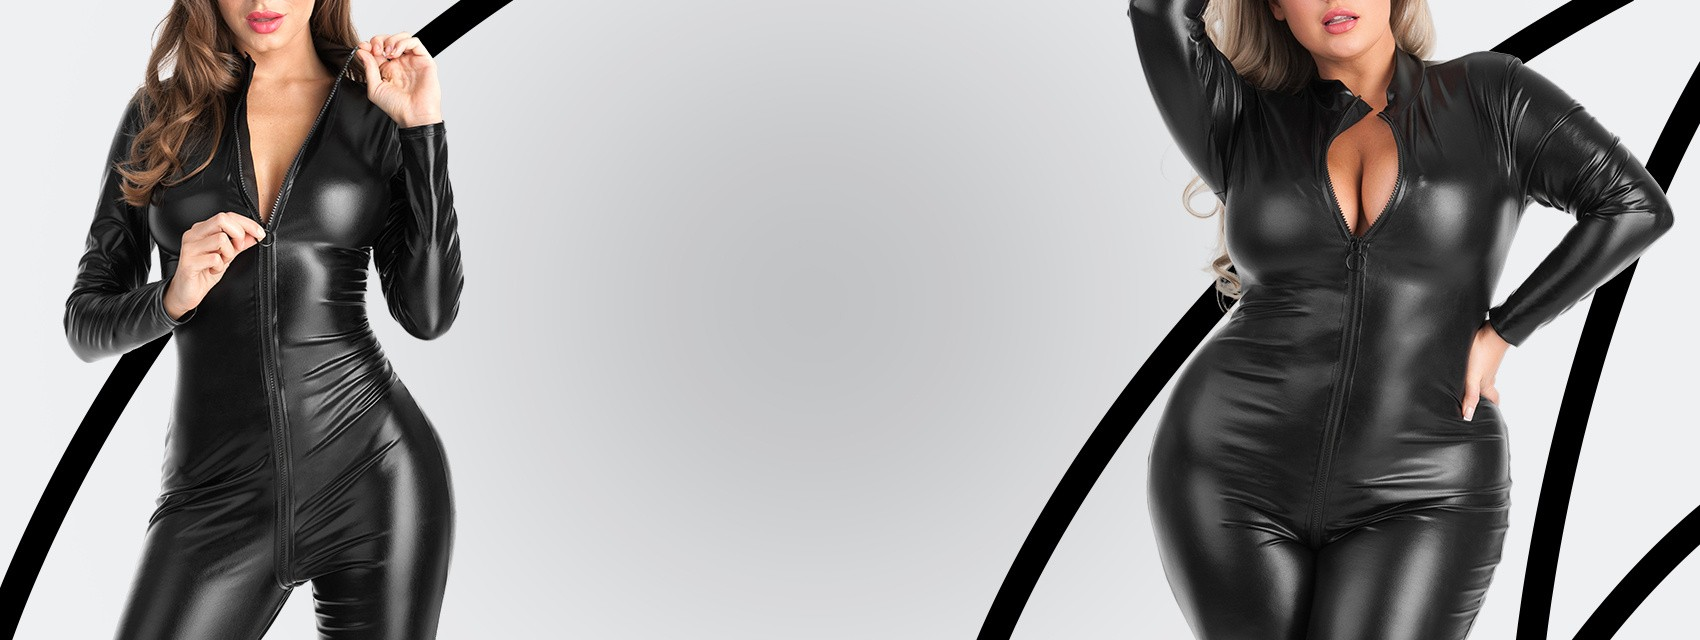 Erotic-Edit-Flatpage-Carousel-Desktop-Zip-Around-Catsuit-2